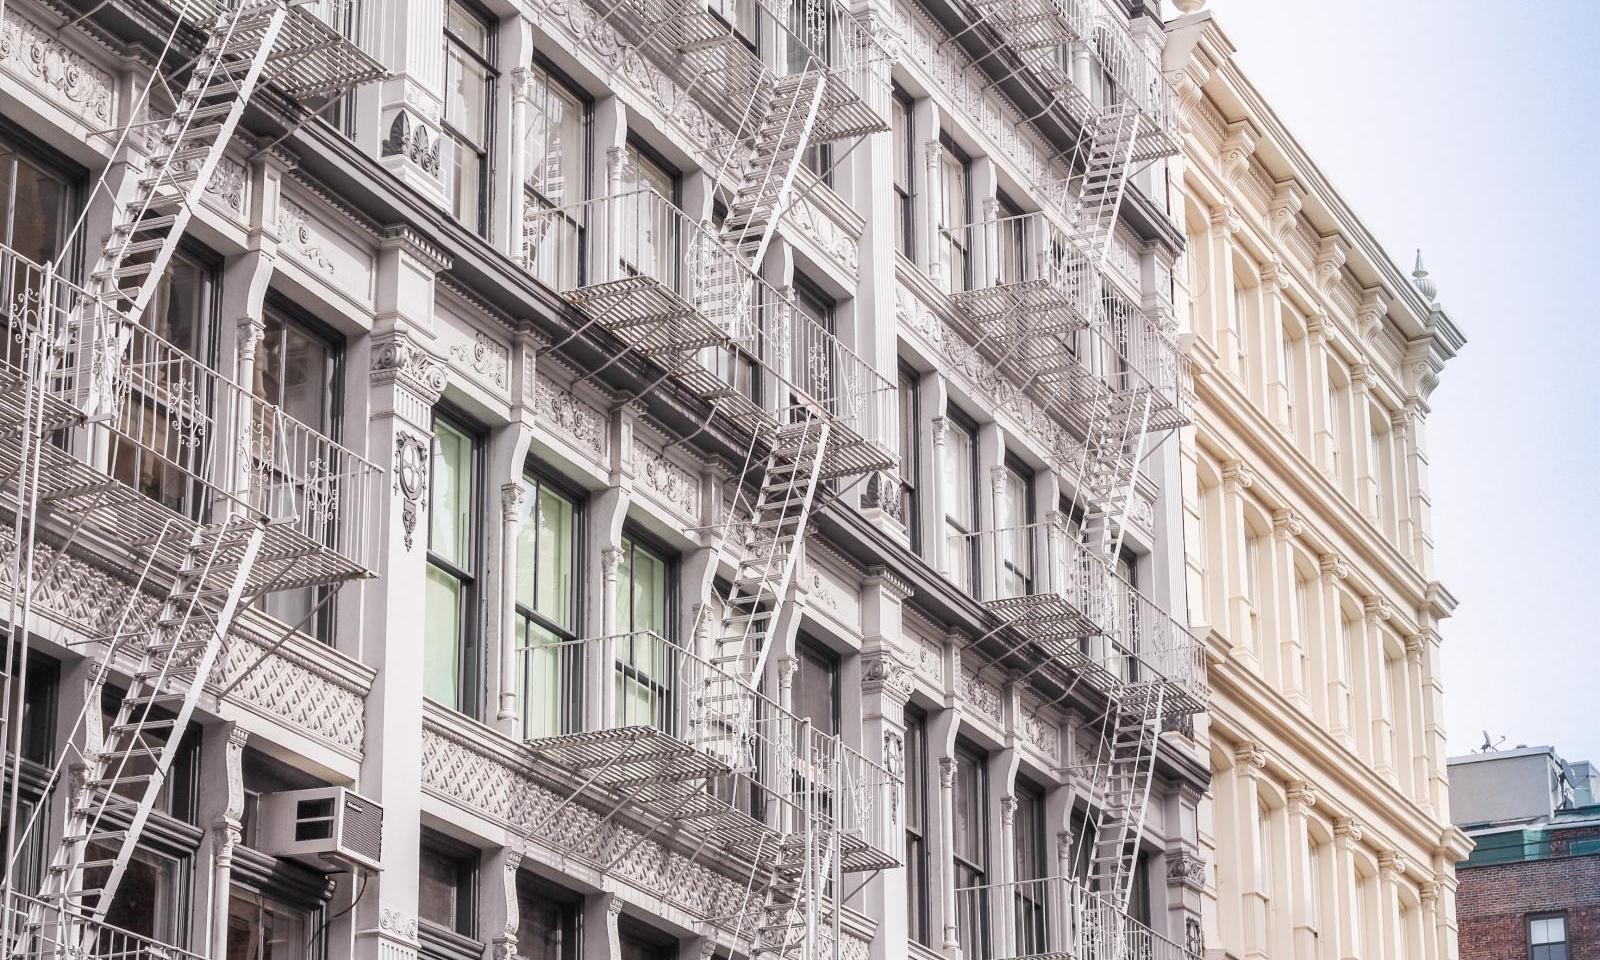 Soho New York Schoudertas : Soho new york city things to do ultimate insider guide